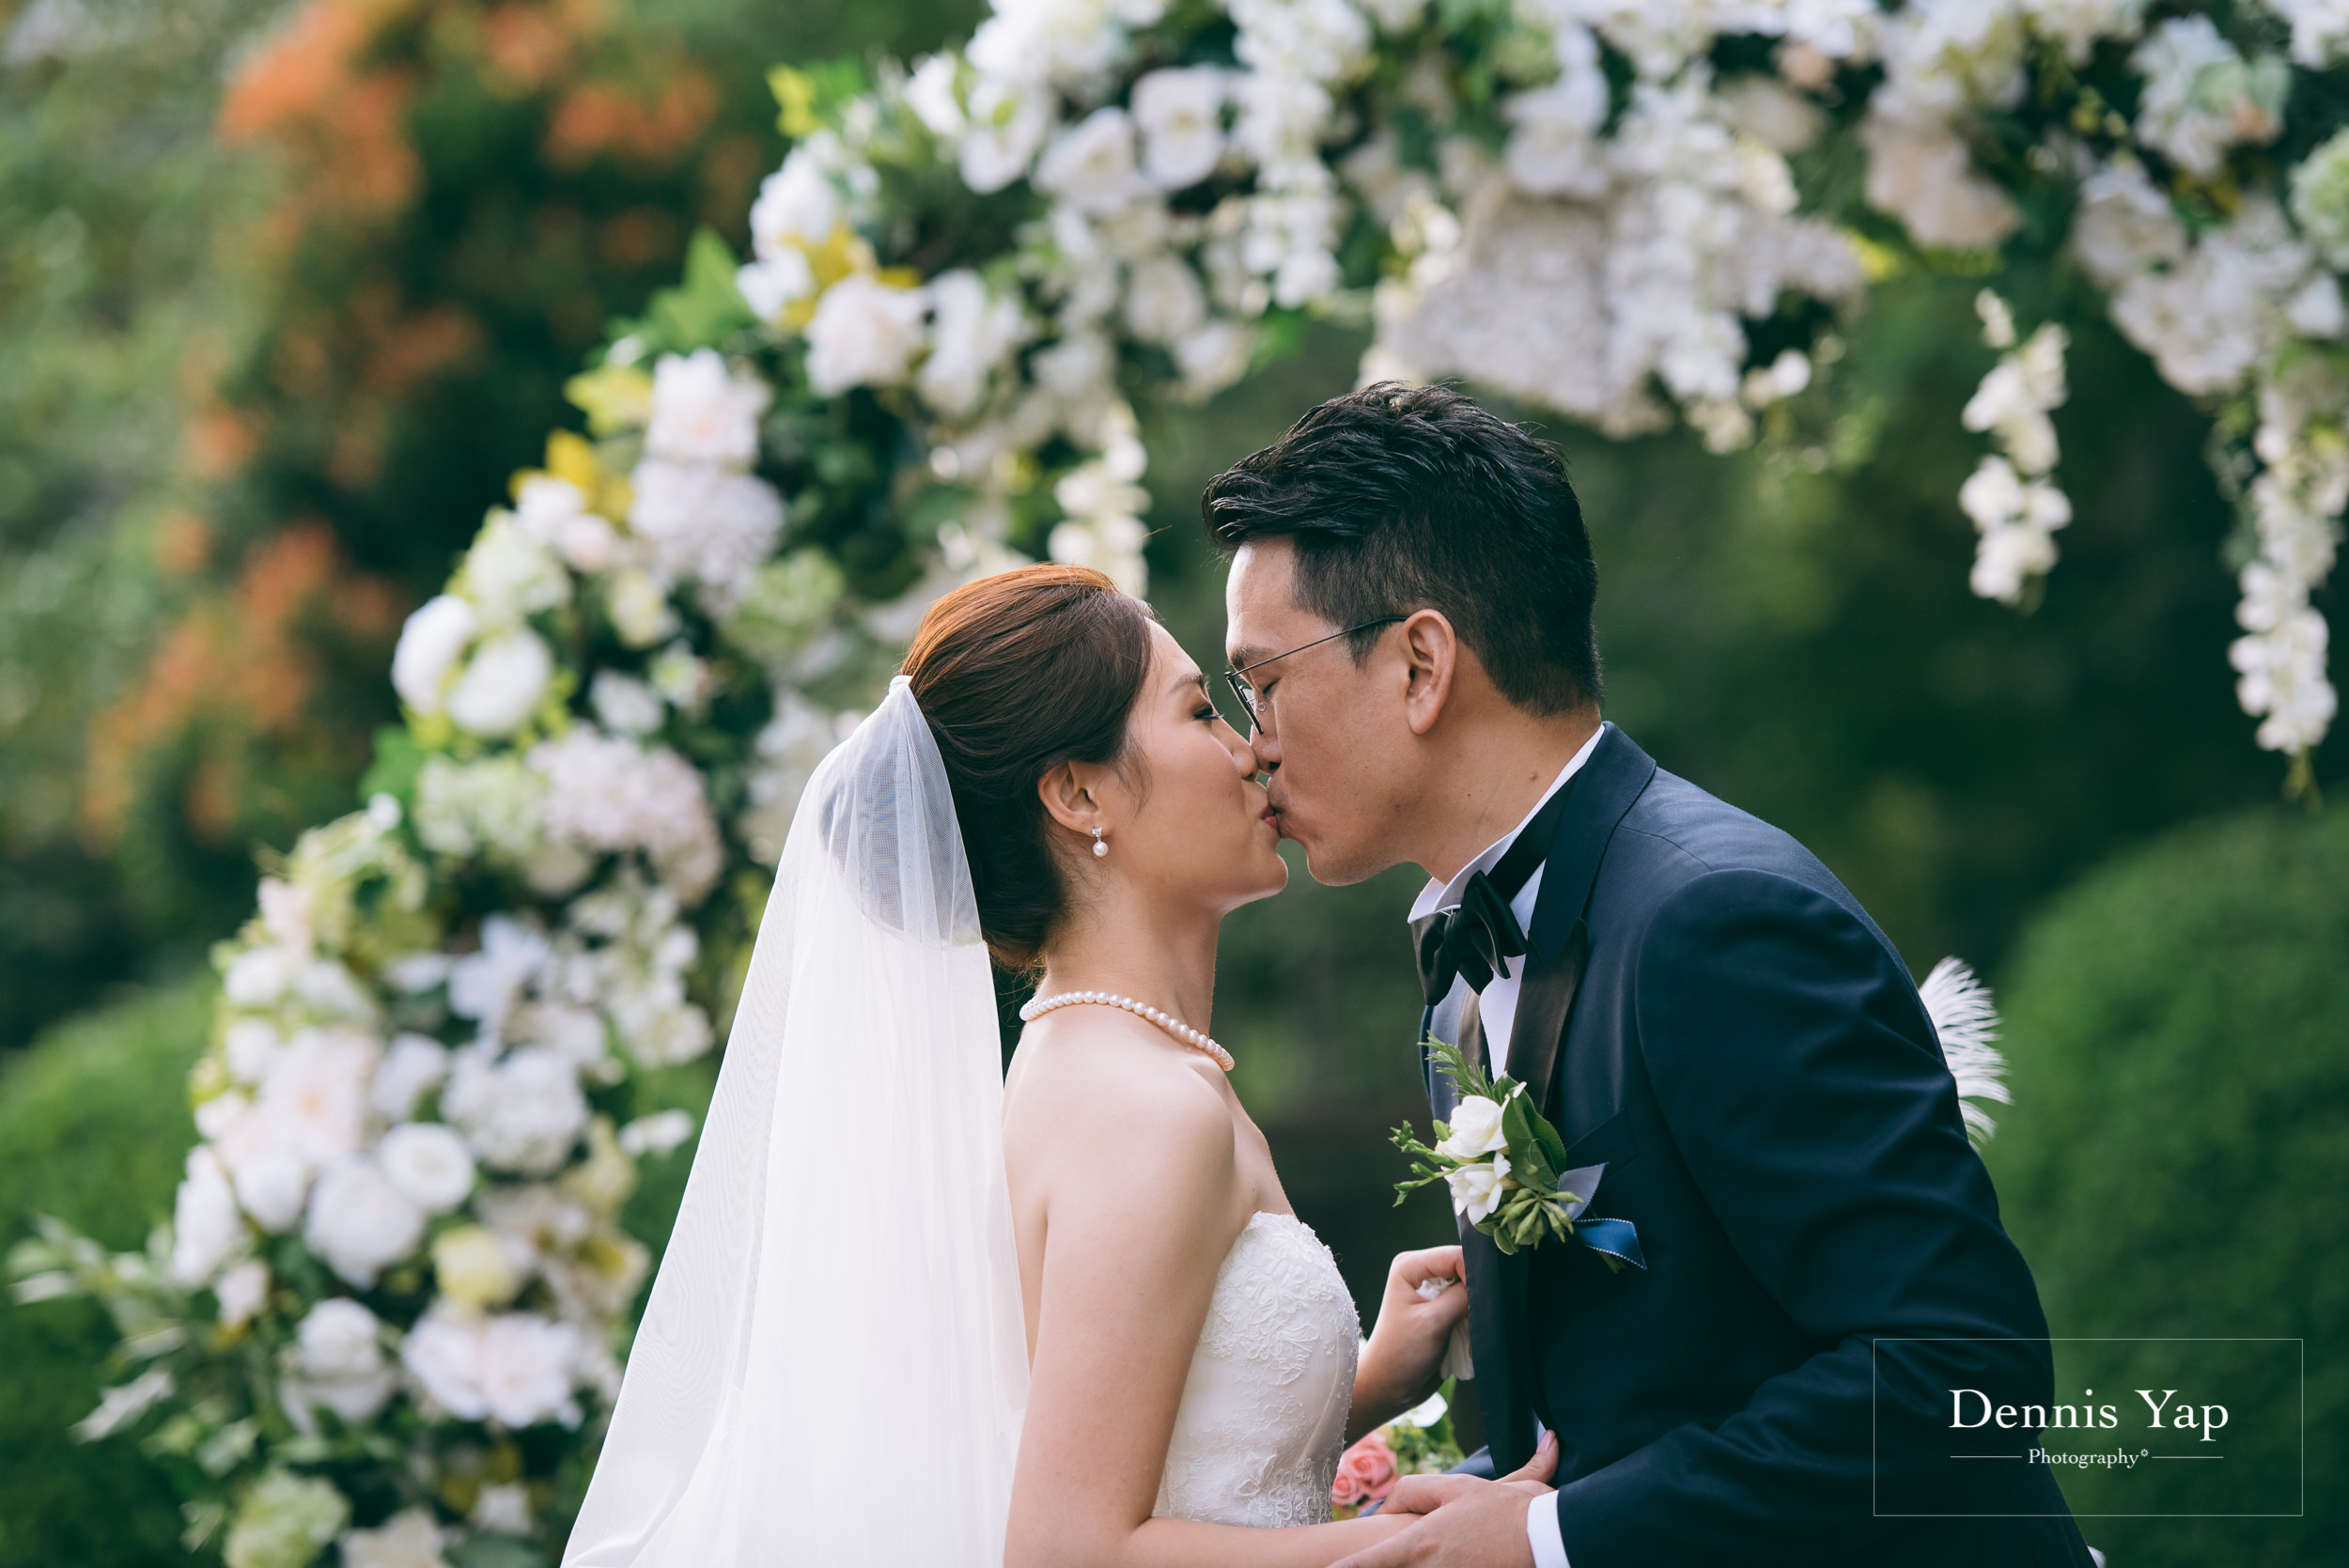 jason crystal wedding day gate crash hong kong garden wedding dennis yap photography-31.jpg